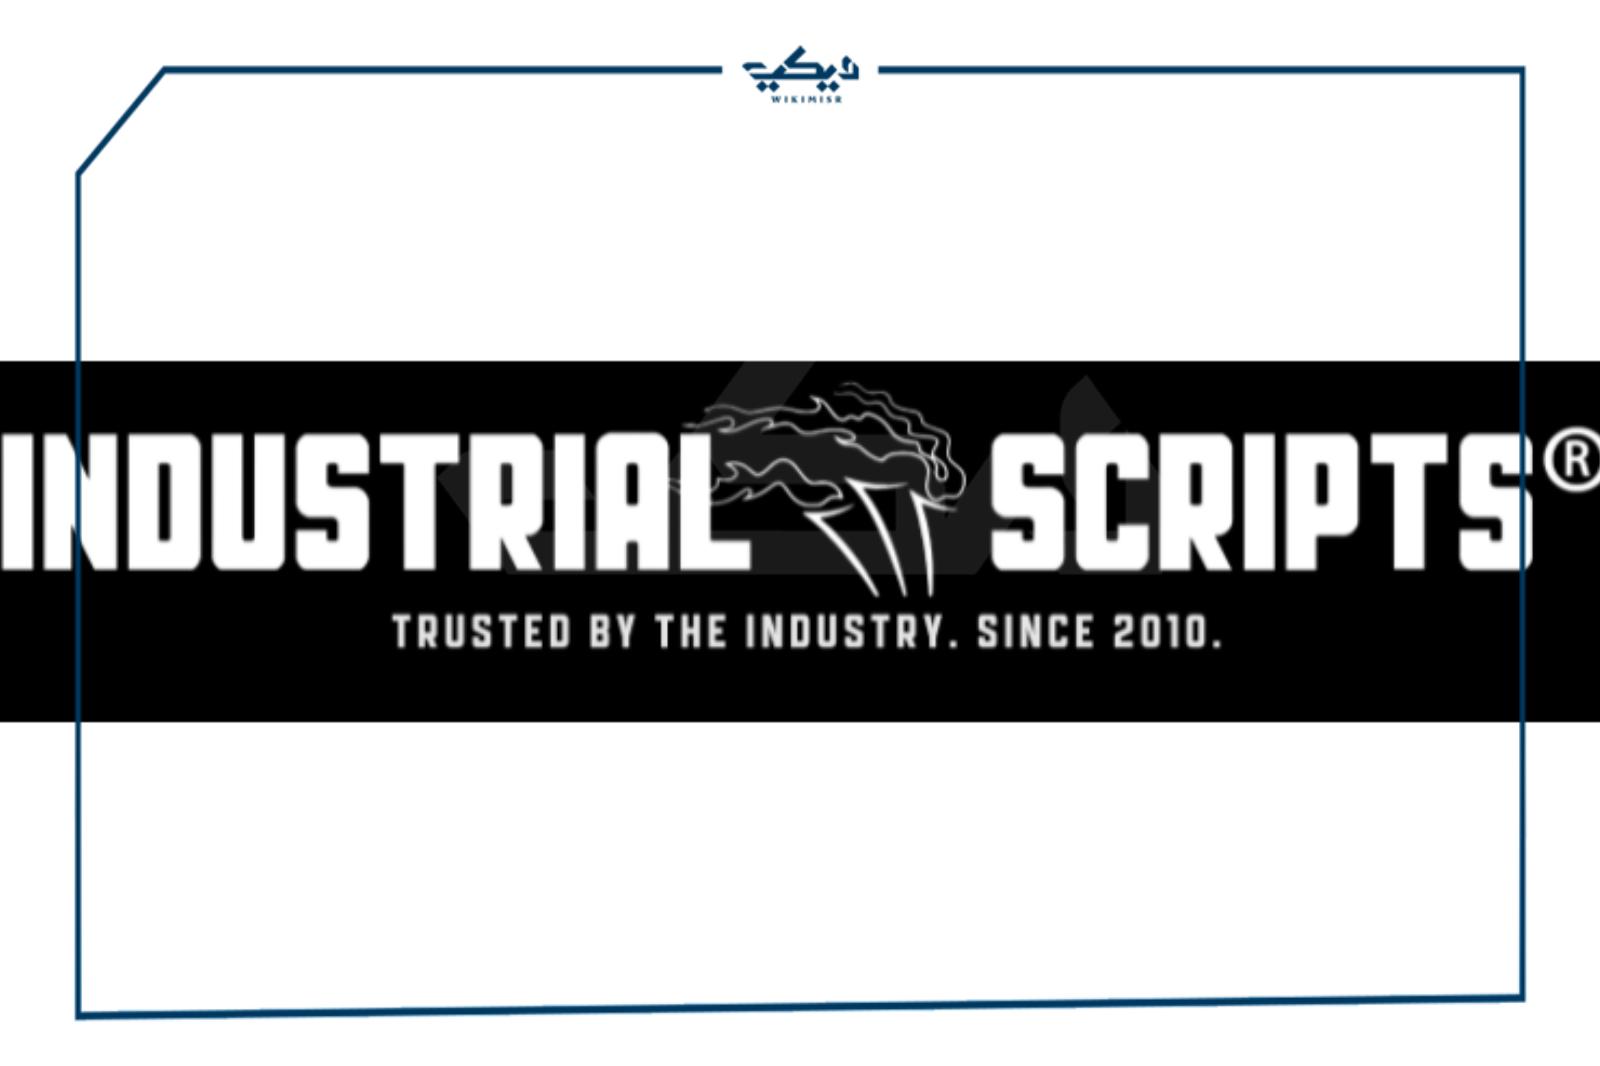 Industrial Scripts